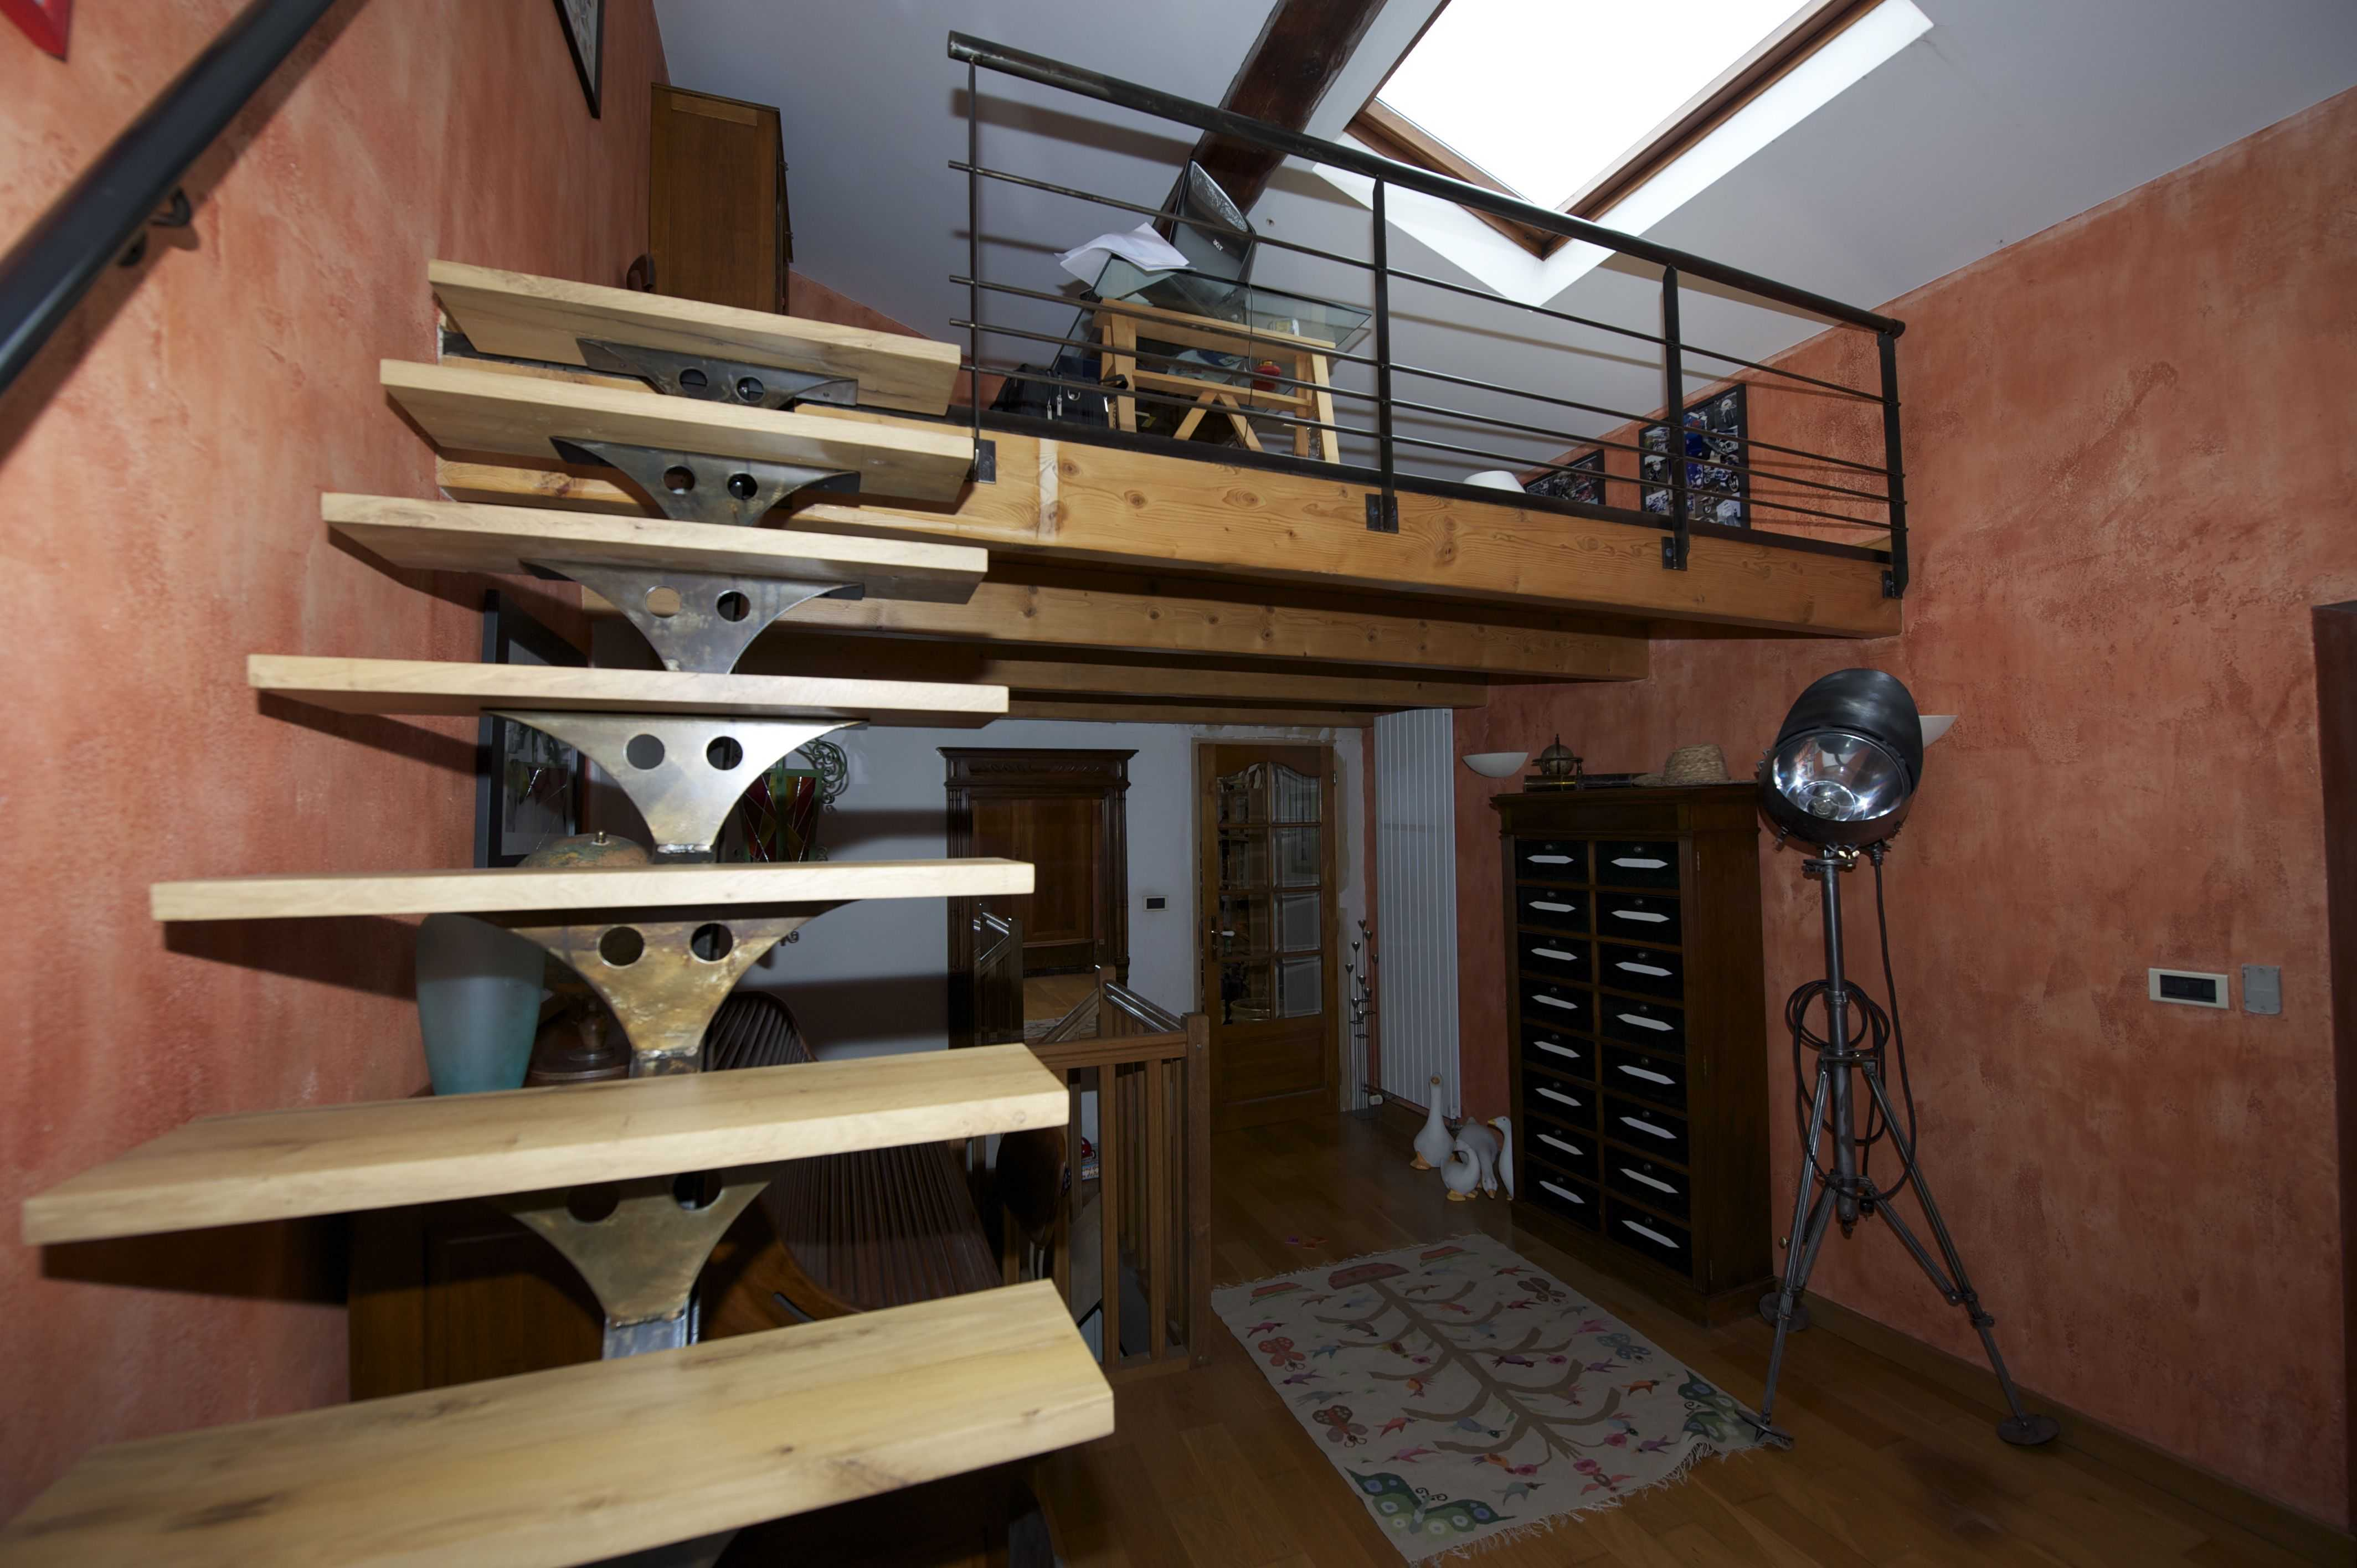 escalier droit str2 cometac. Black Bedroom Furniture Sets. Home Design Ideas